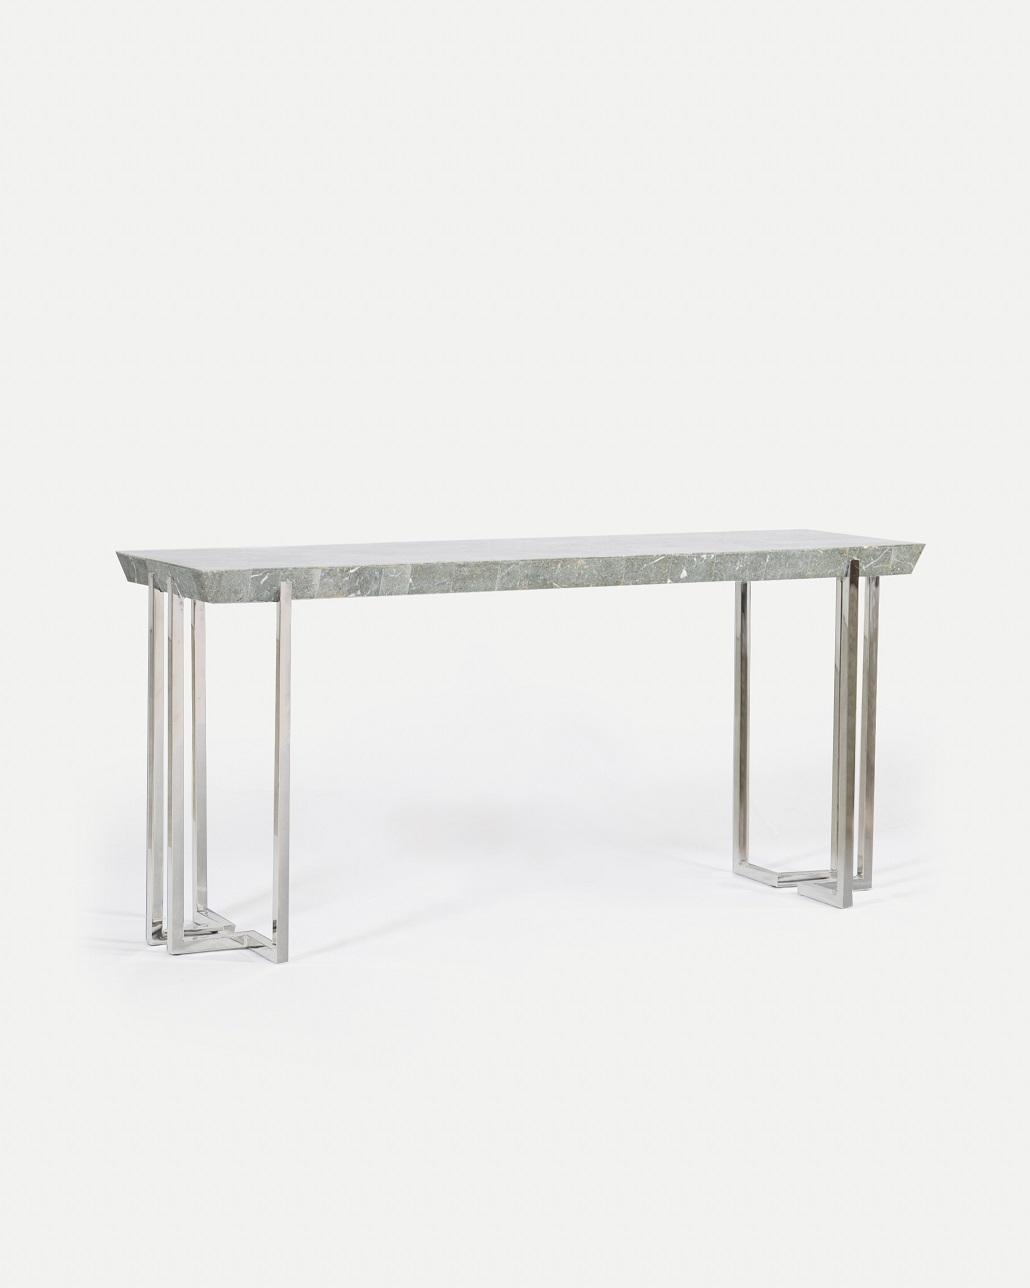 Co-Creative Studio, Detalia Aurora, Ercole Tables, Gray Stone Lamination, Stainless Steel.jpg